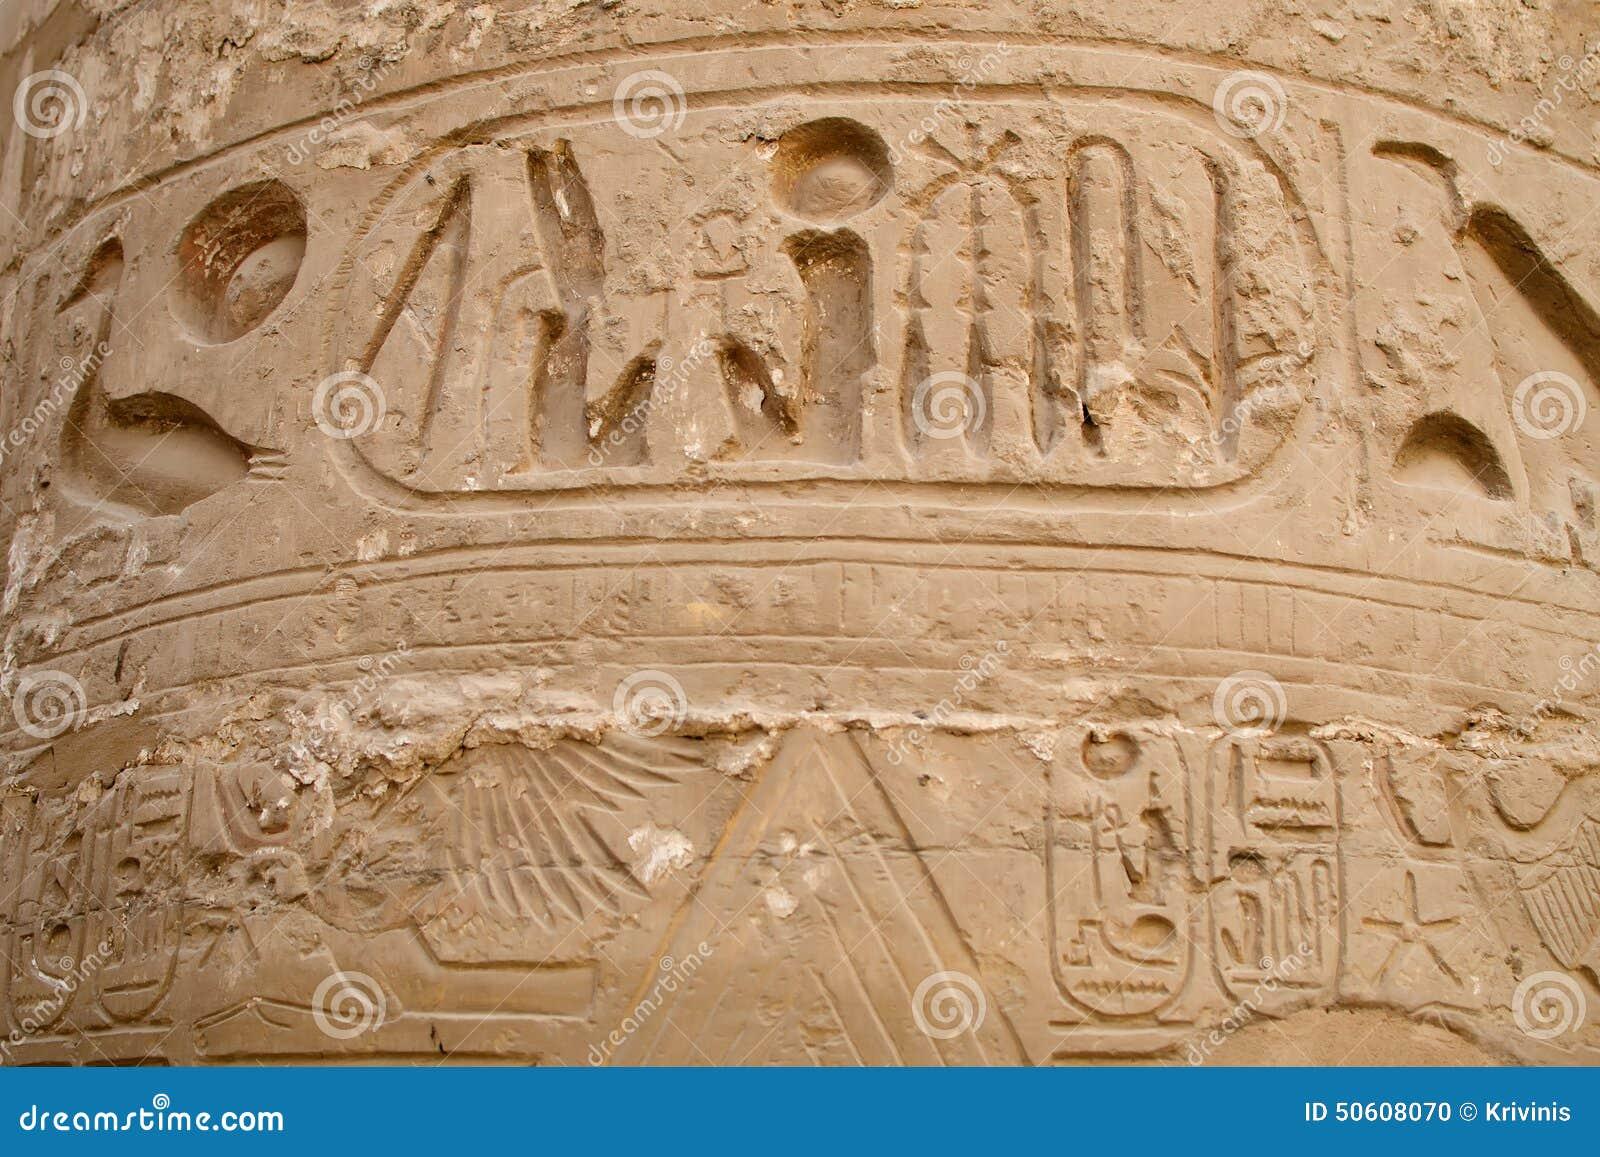 Hiërogliefen in Gebied van amun-Re (Karnak-Complexe Tempel, Luxor, Egypte)